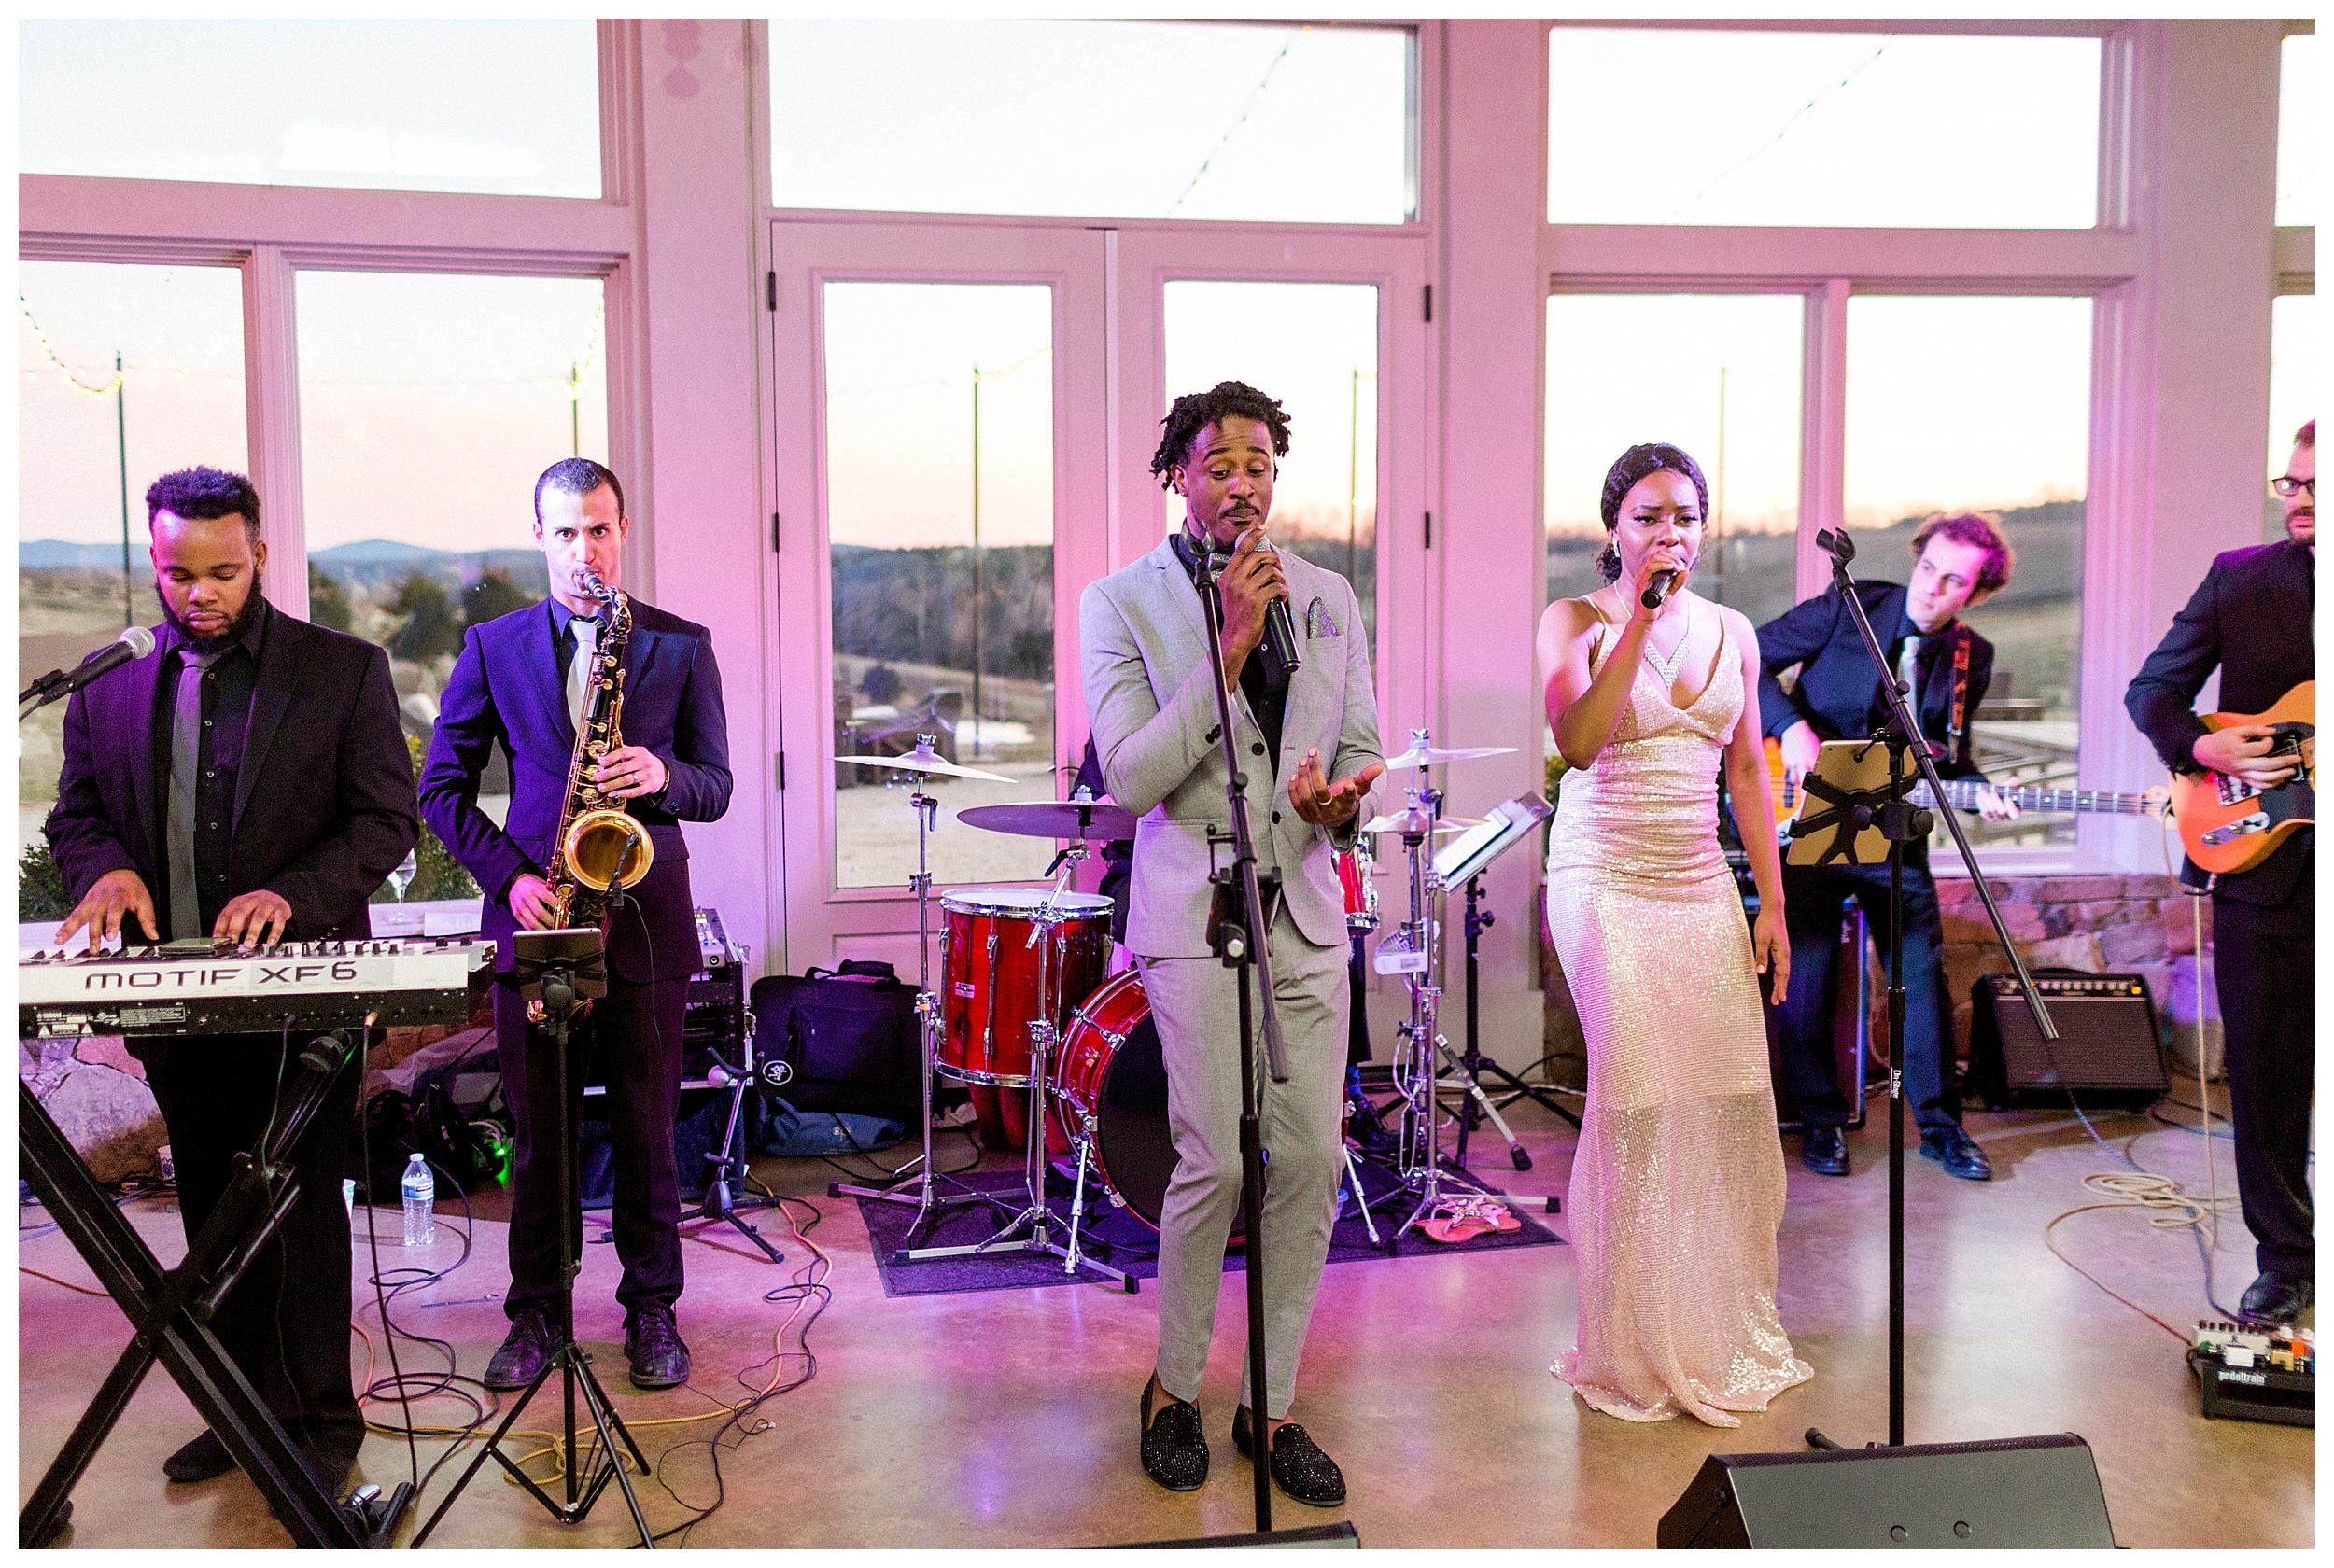 Stone Tower Winery Wedding | Virginia Winter Wedding | VA Wedding Photographer Kir Tuben_0110.jpg